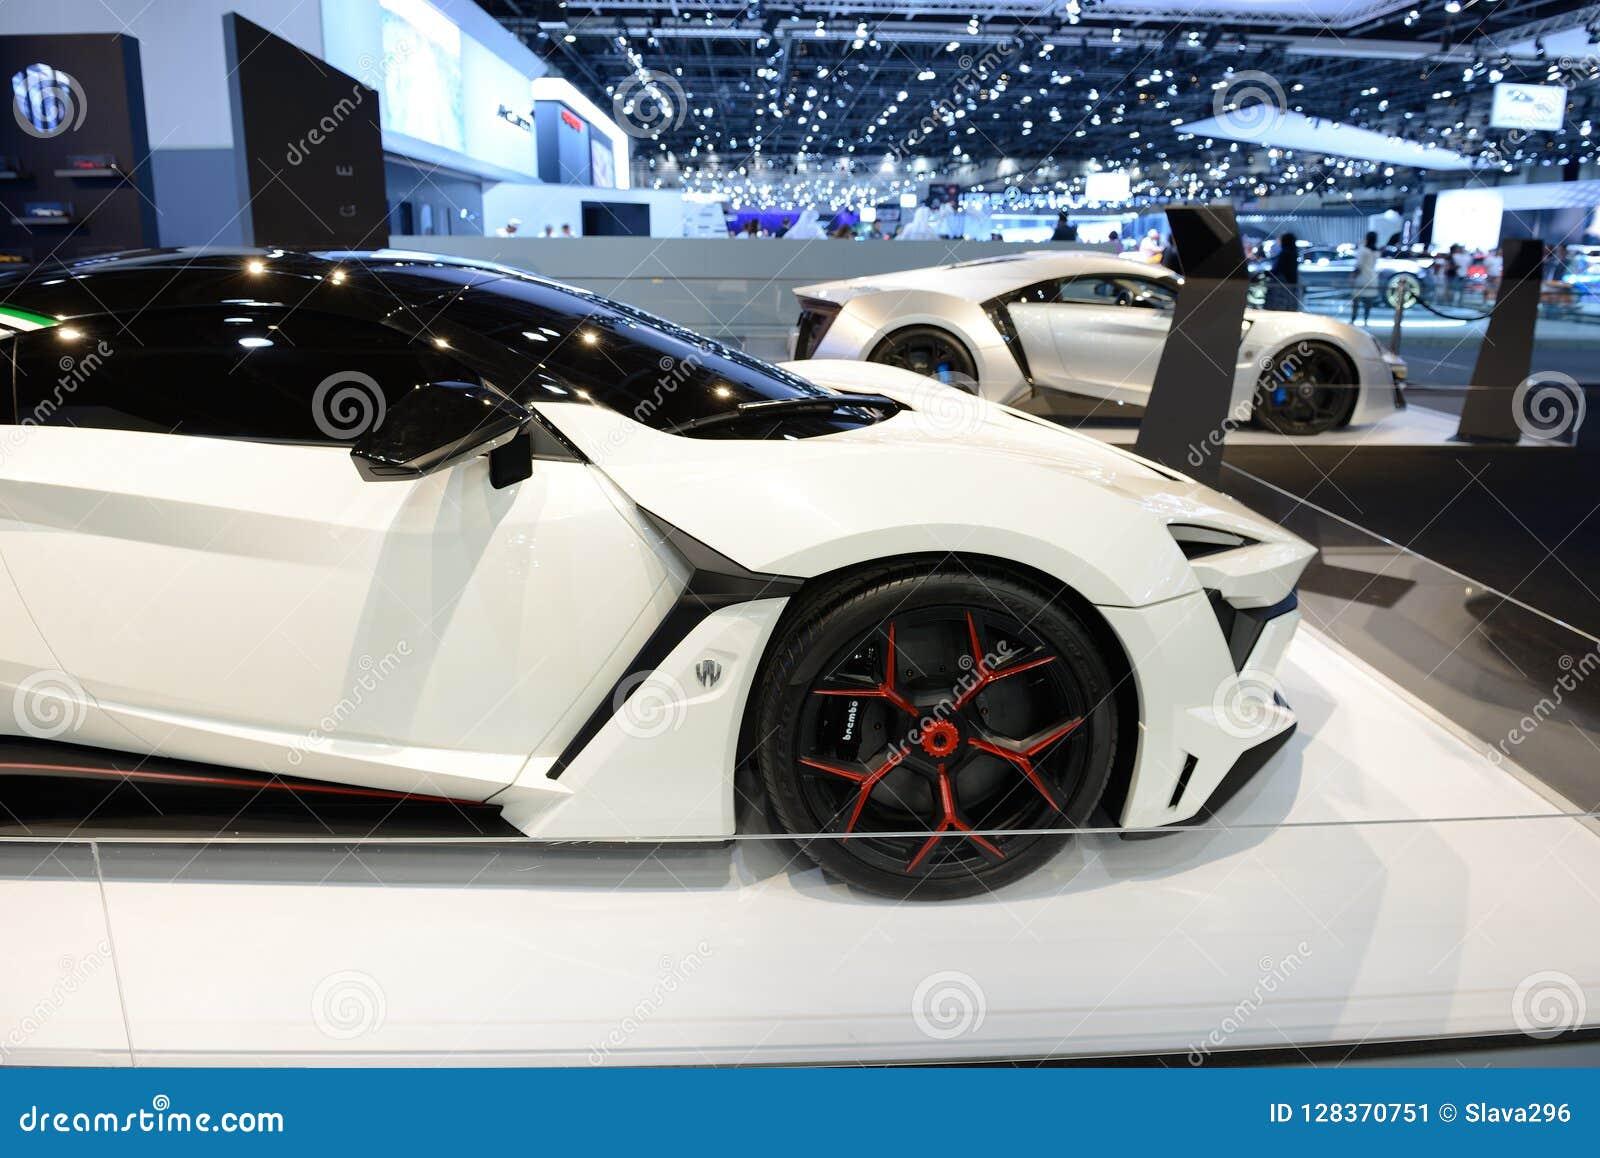 The Wmotors Fenyr And Lykan Hypersport Cars Is On Dubai Motor Show